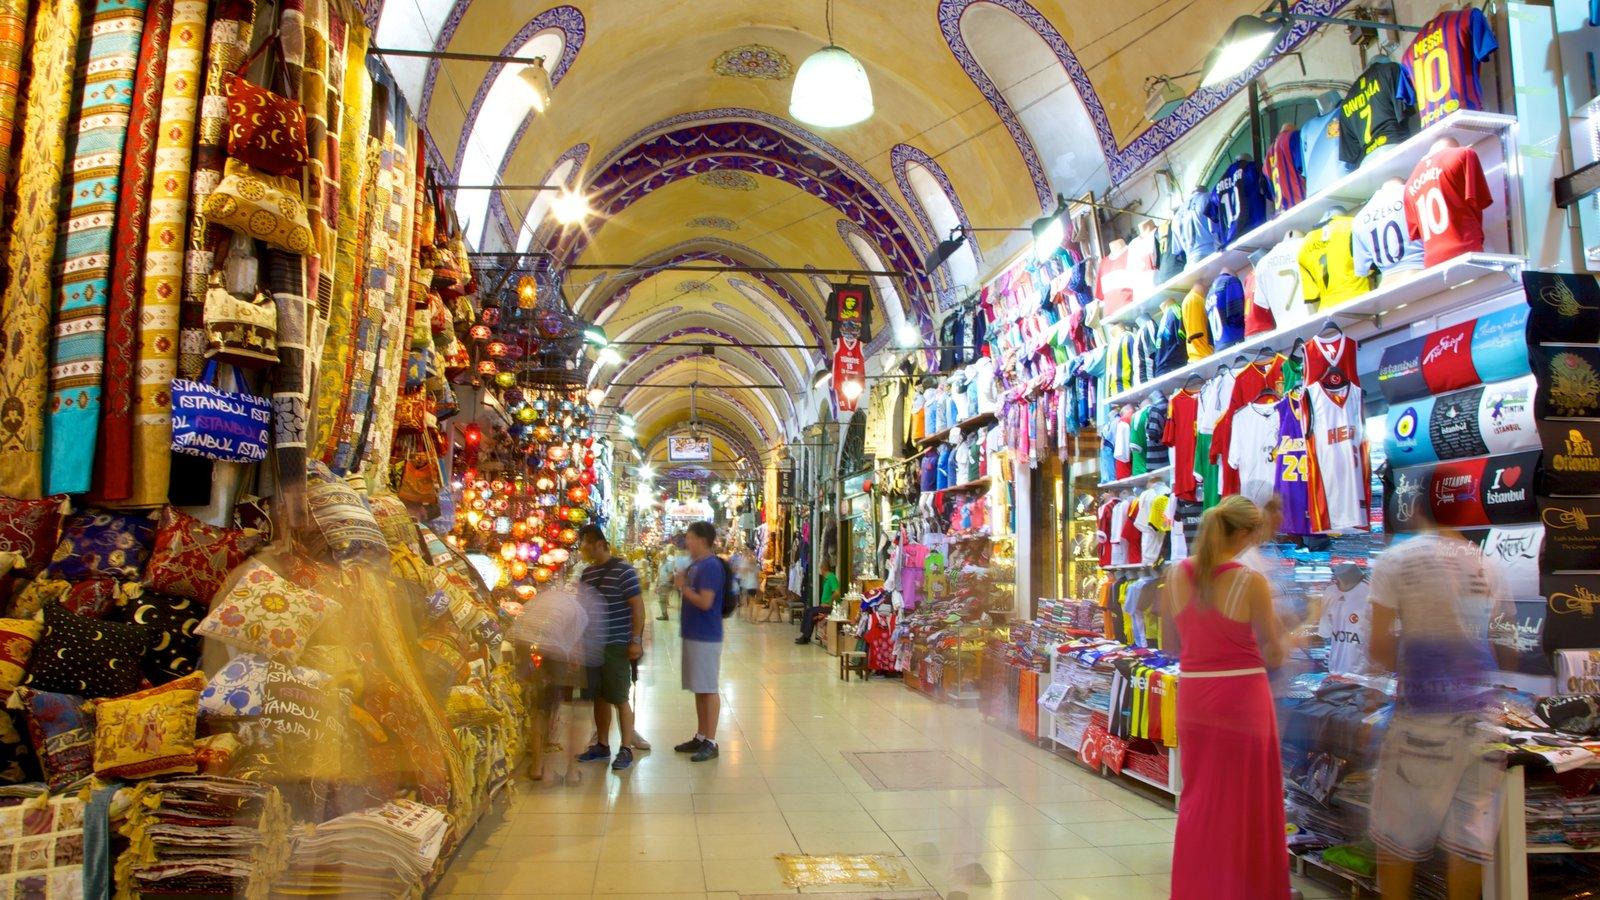 Grand Bazaar showing interior views, shopping and markets